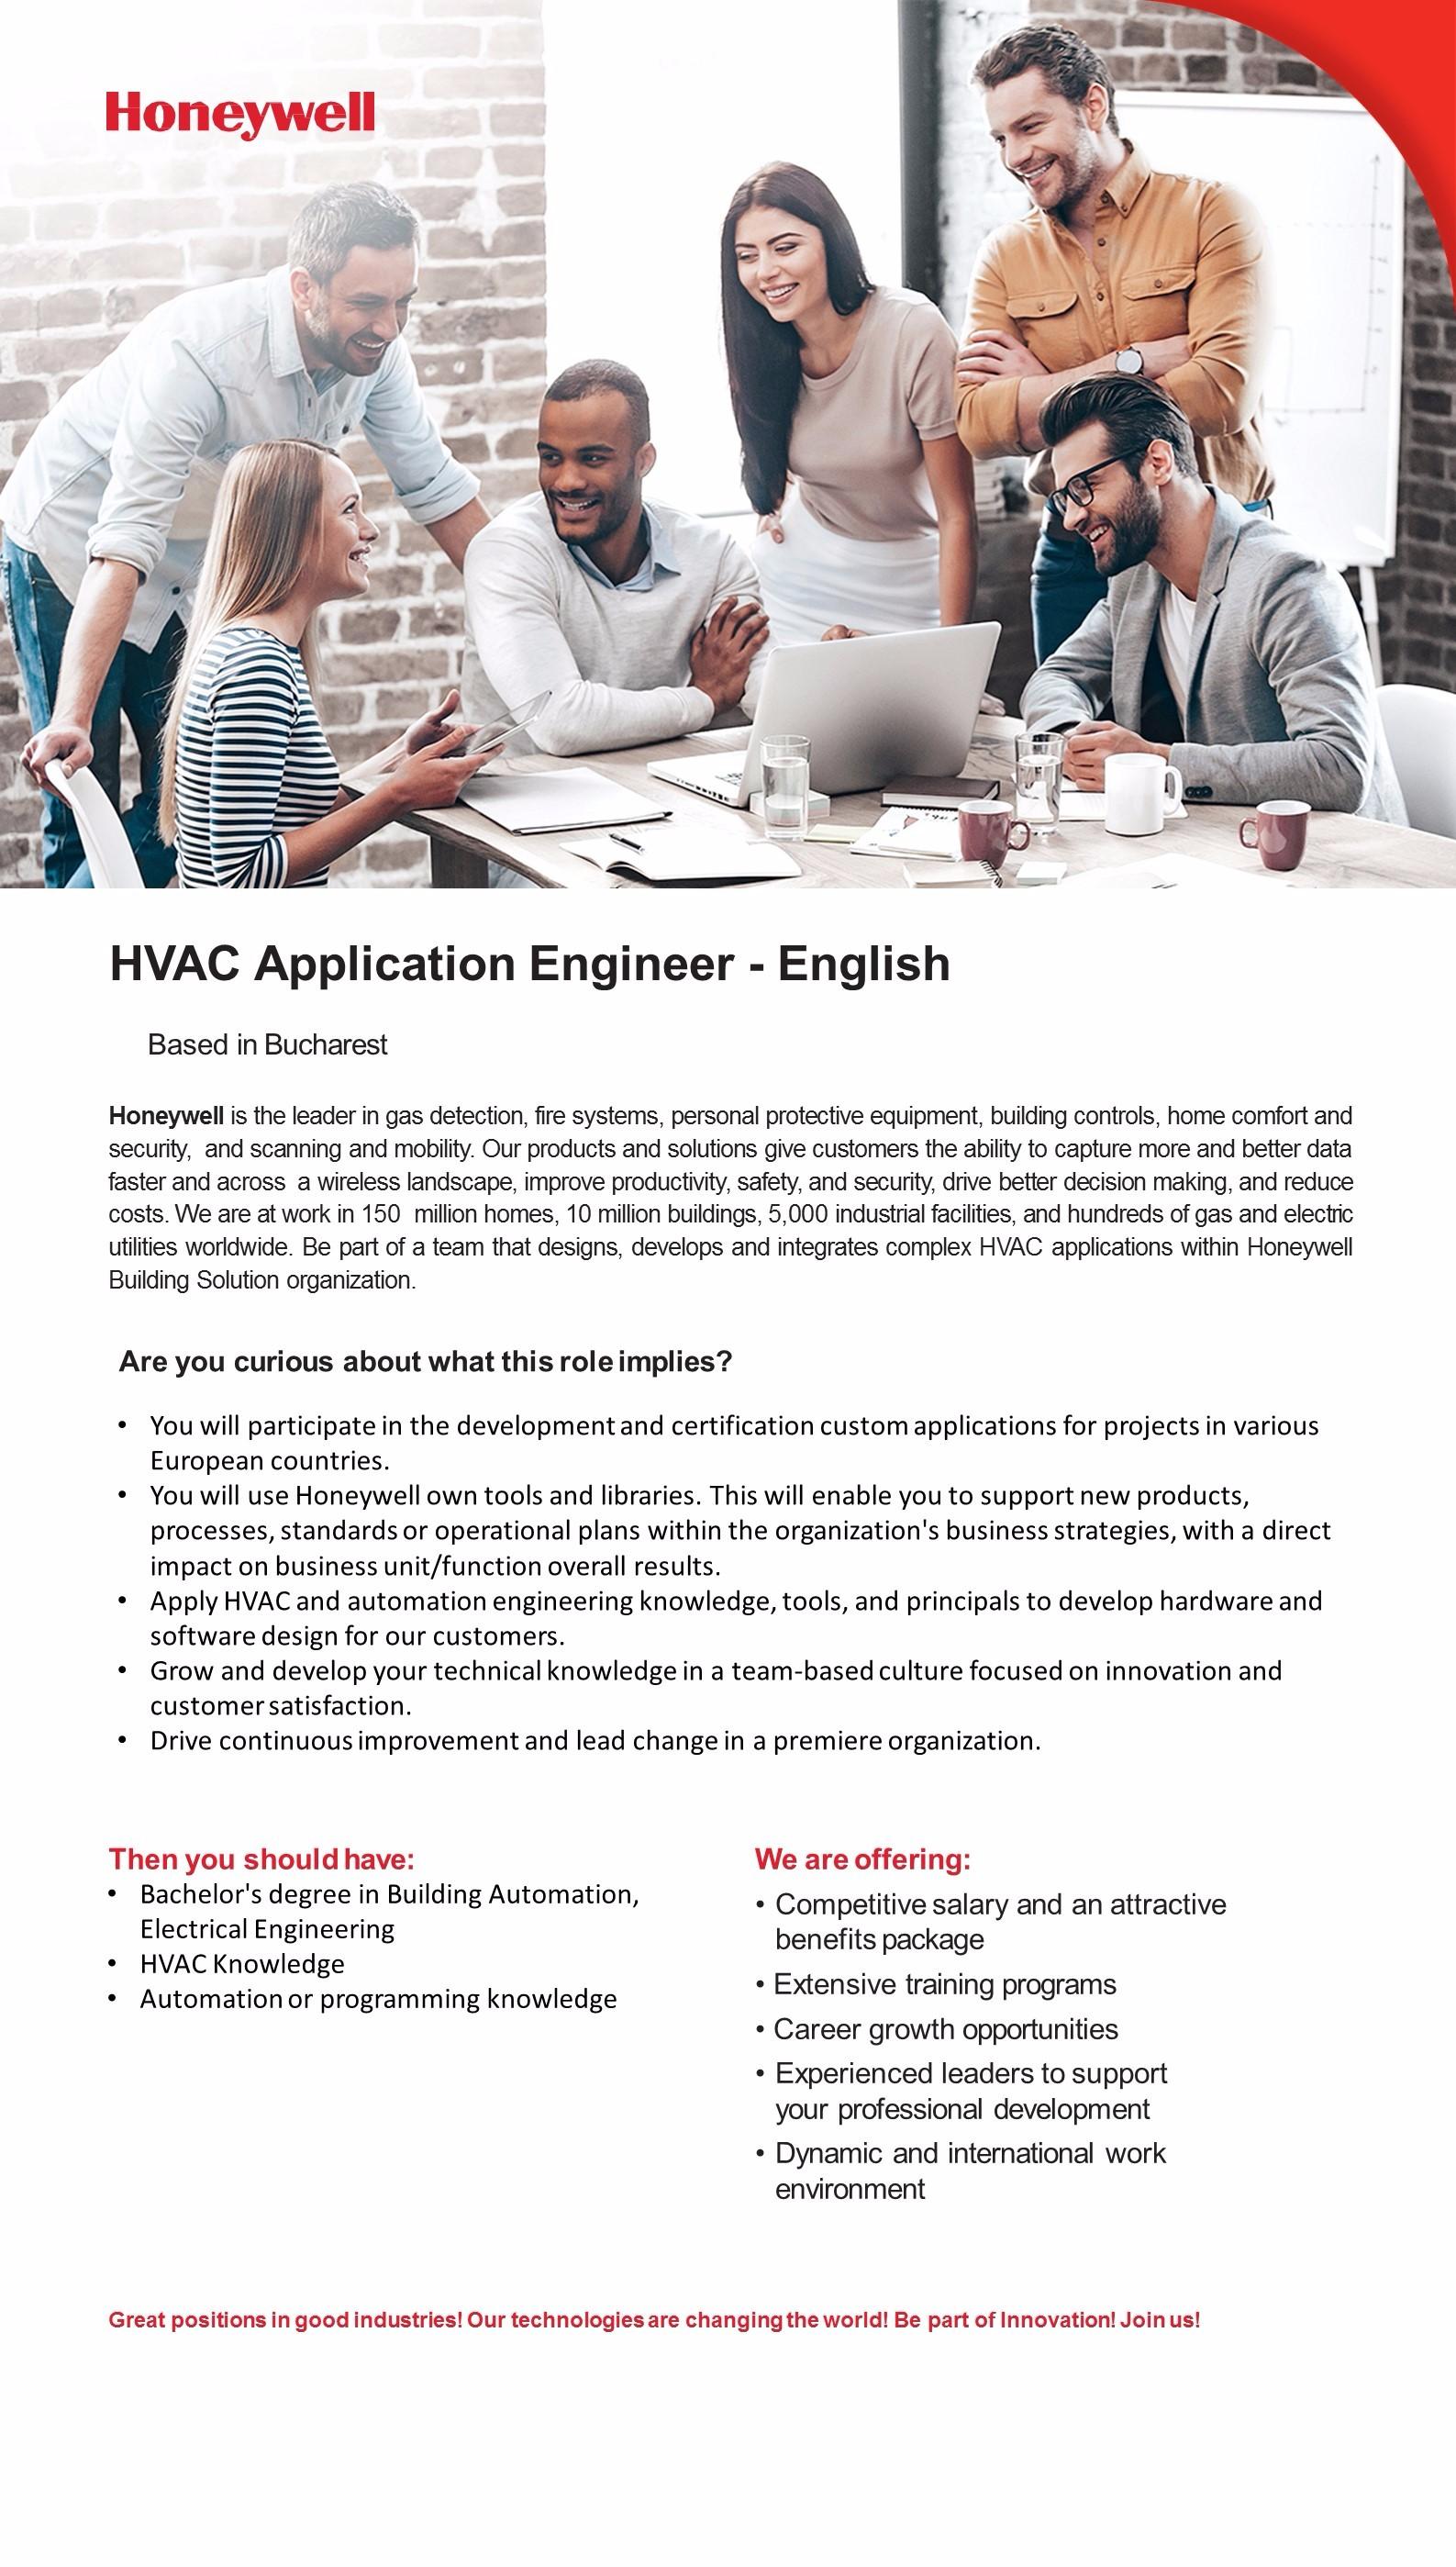 HVAC Application Engineer